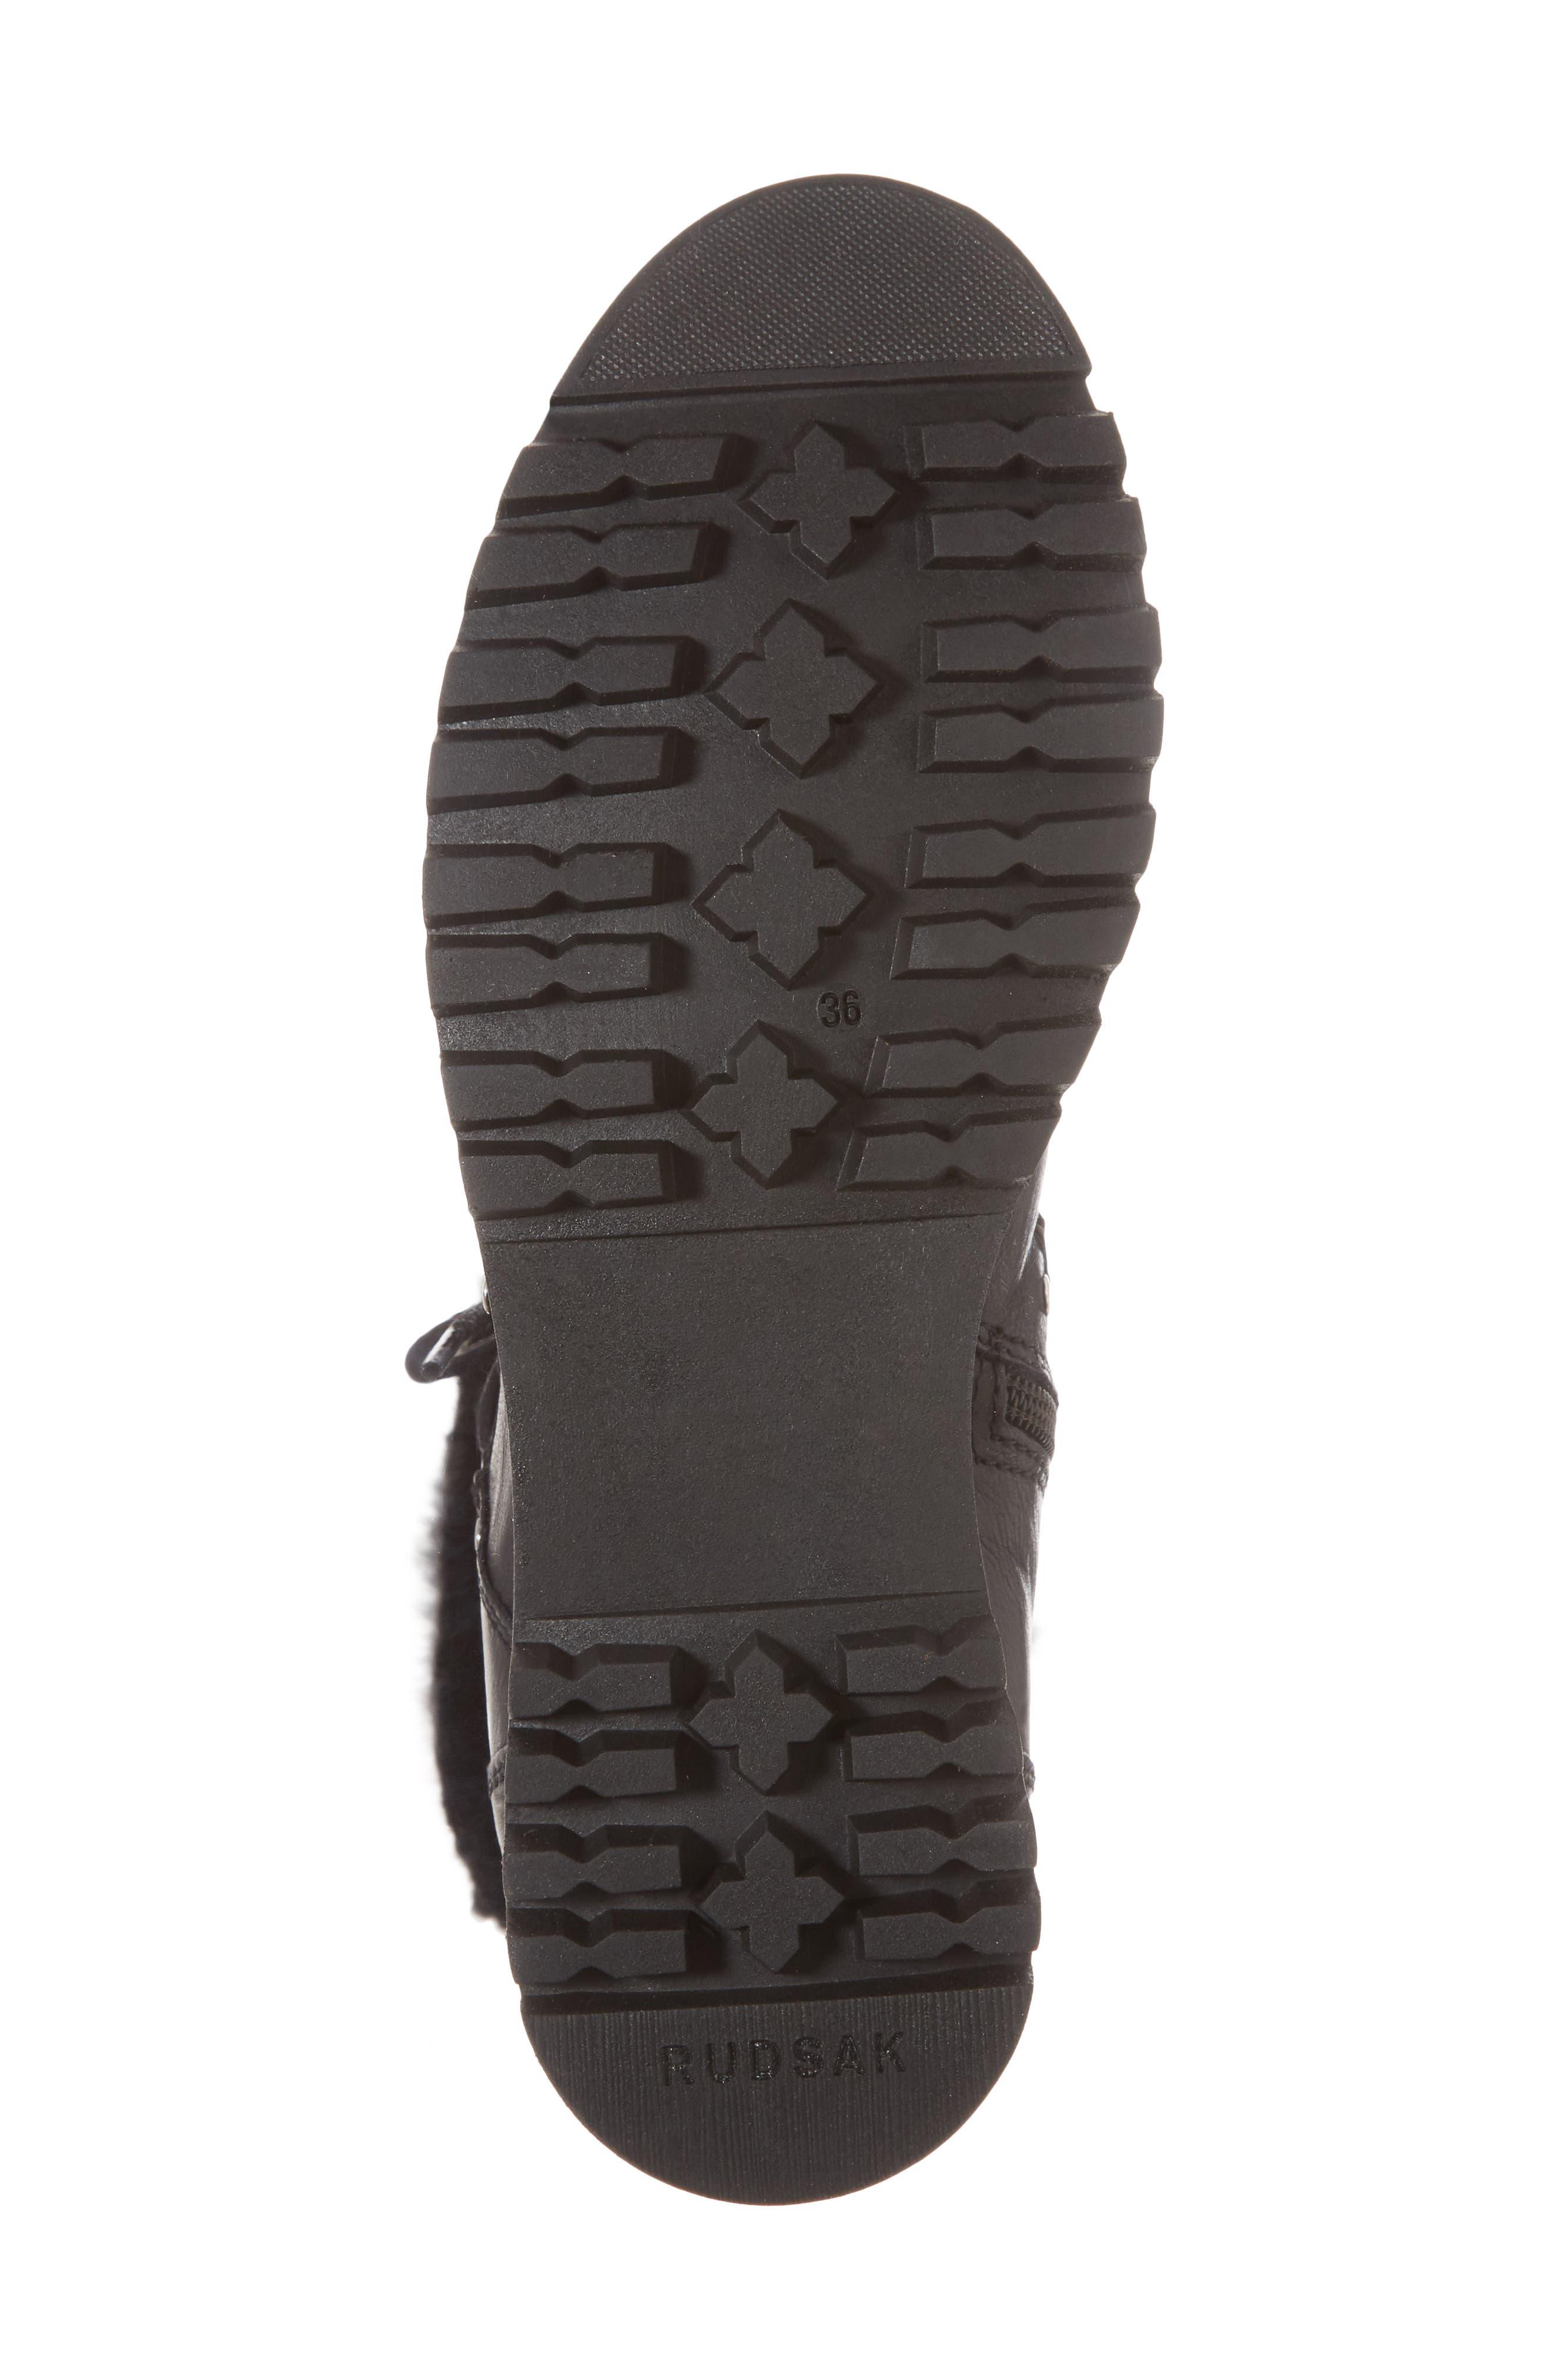 Tellurian Genuine Rabbit Fur Cuff Boot,                             Alternate thumbnail 6, color,                             Black Leather